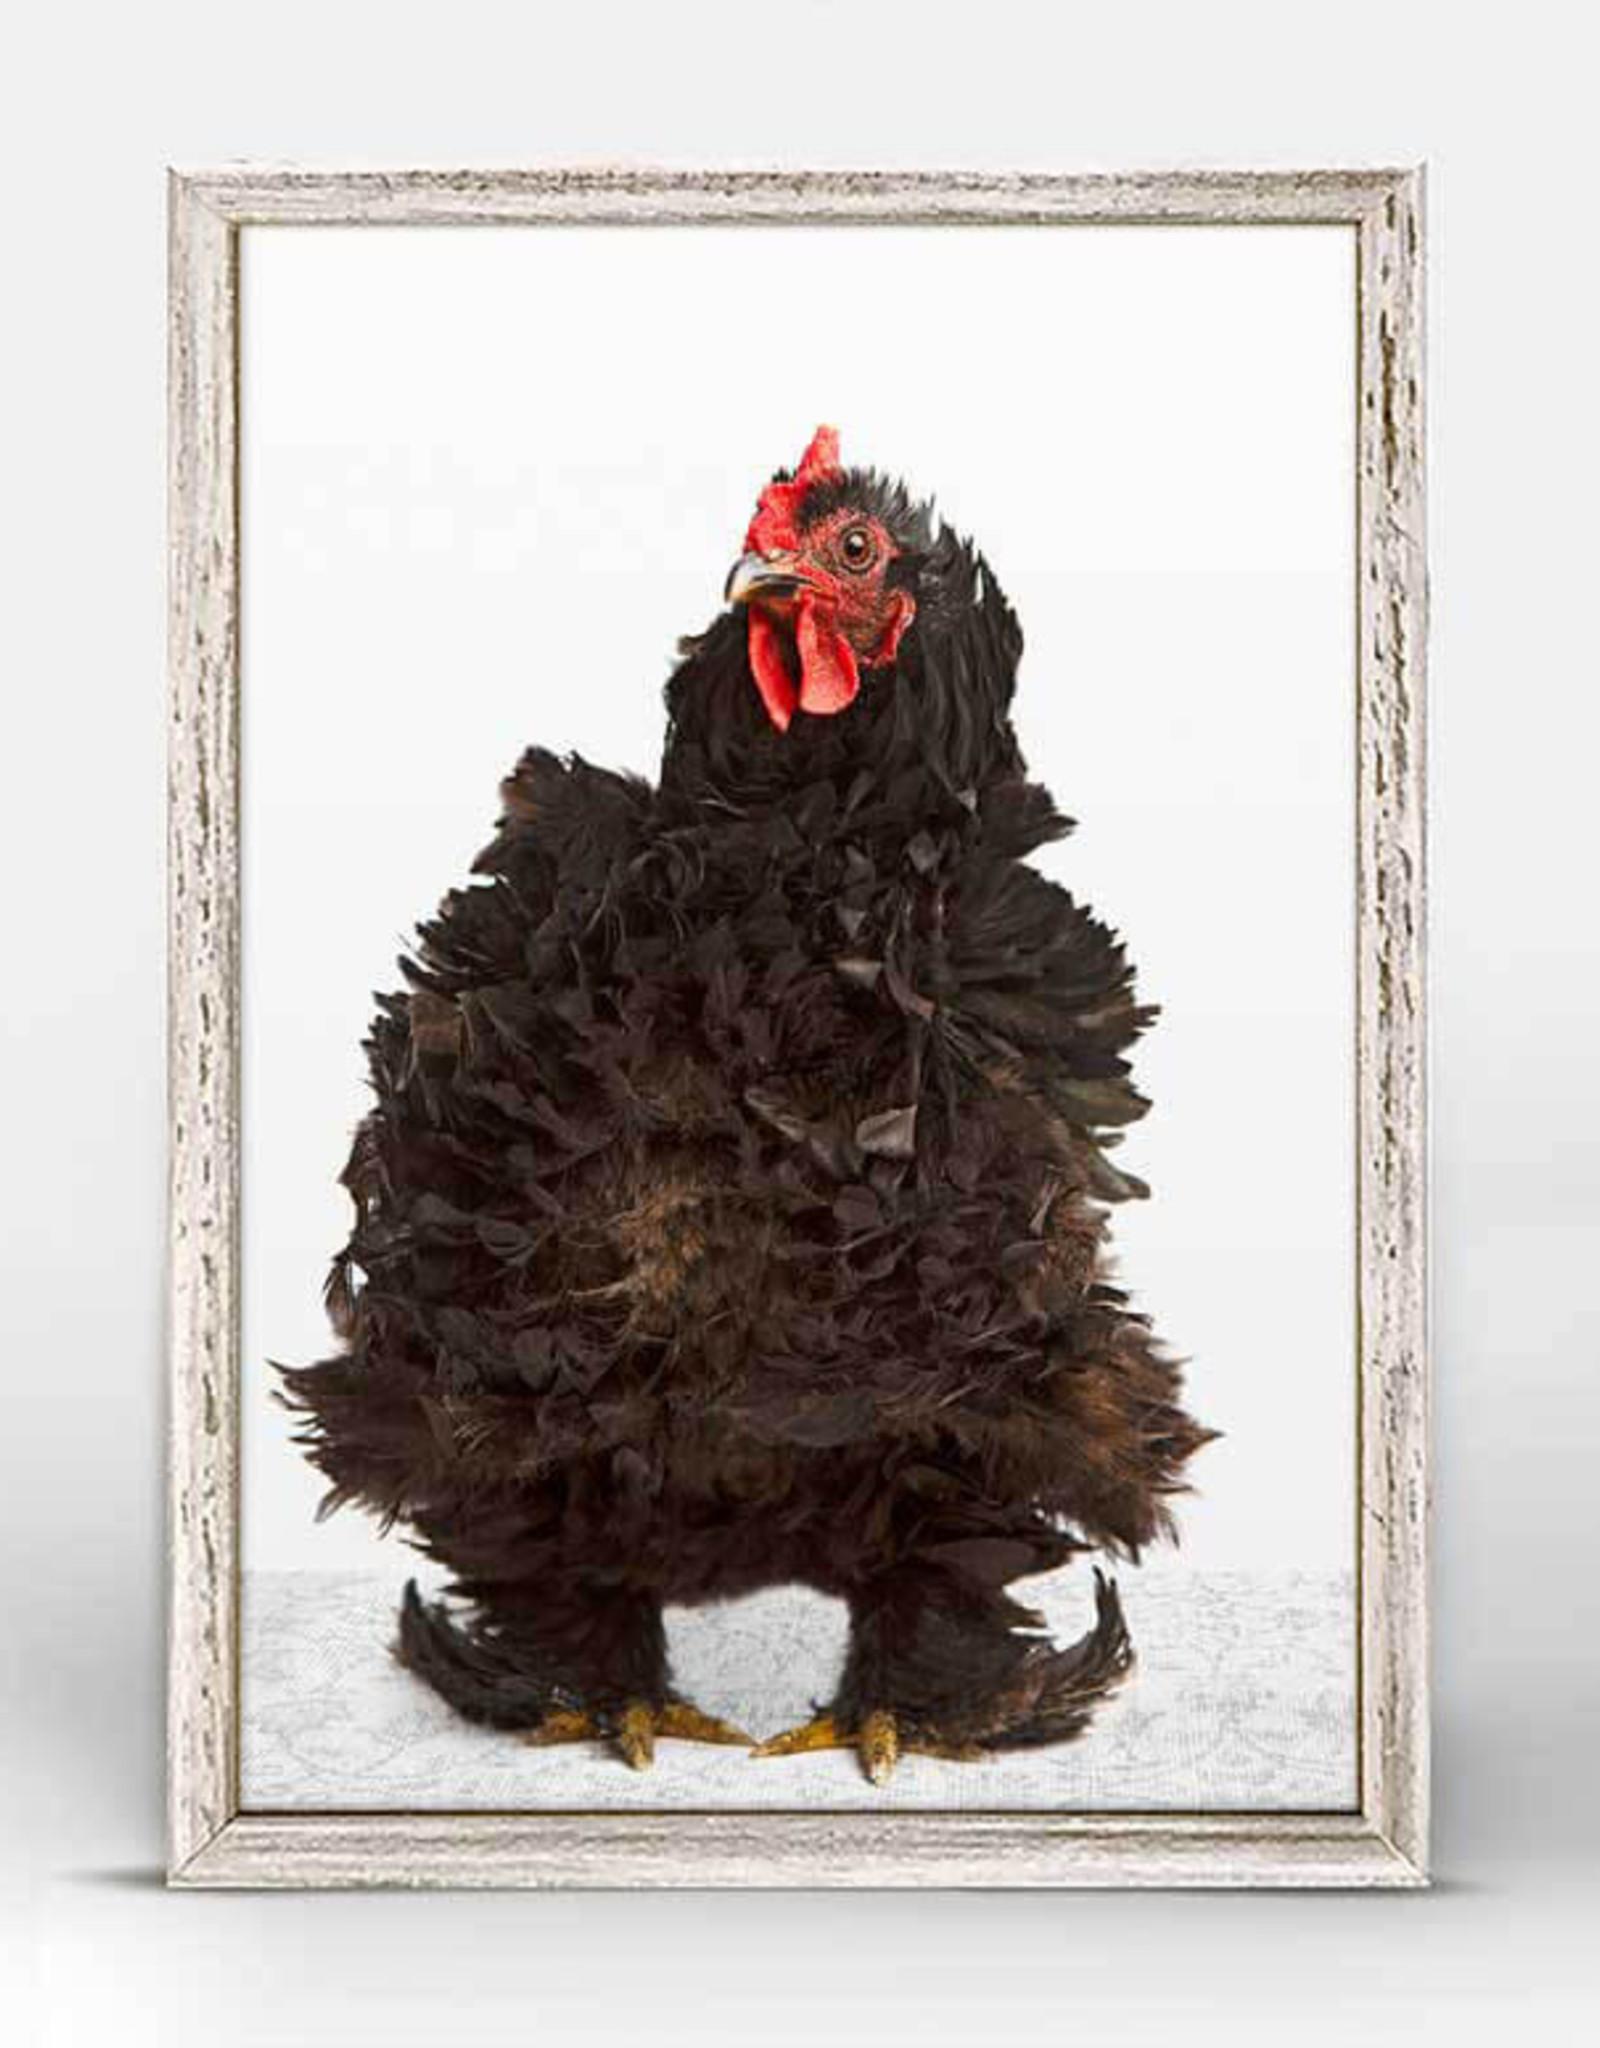 Greenbox Art Greenbox Charming Chickens So Fluffy Mini Canvas